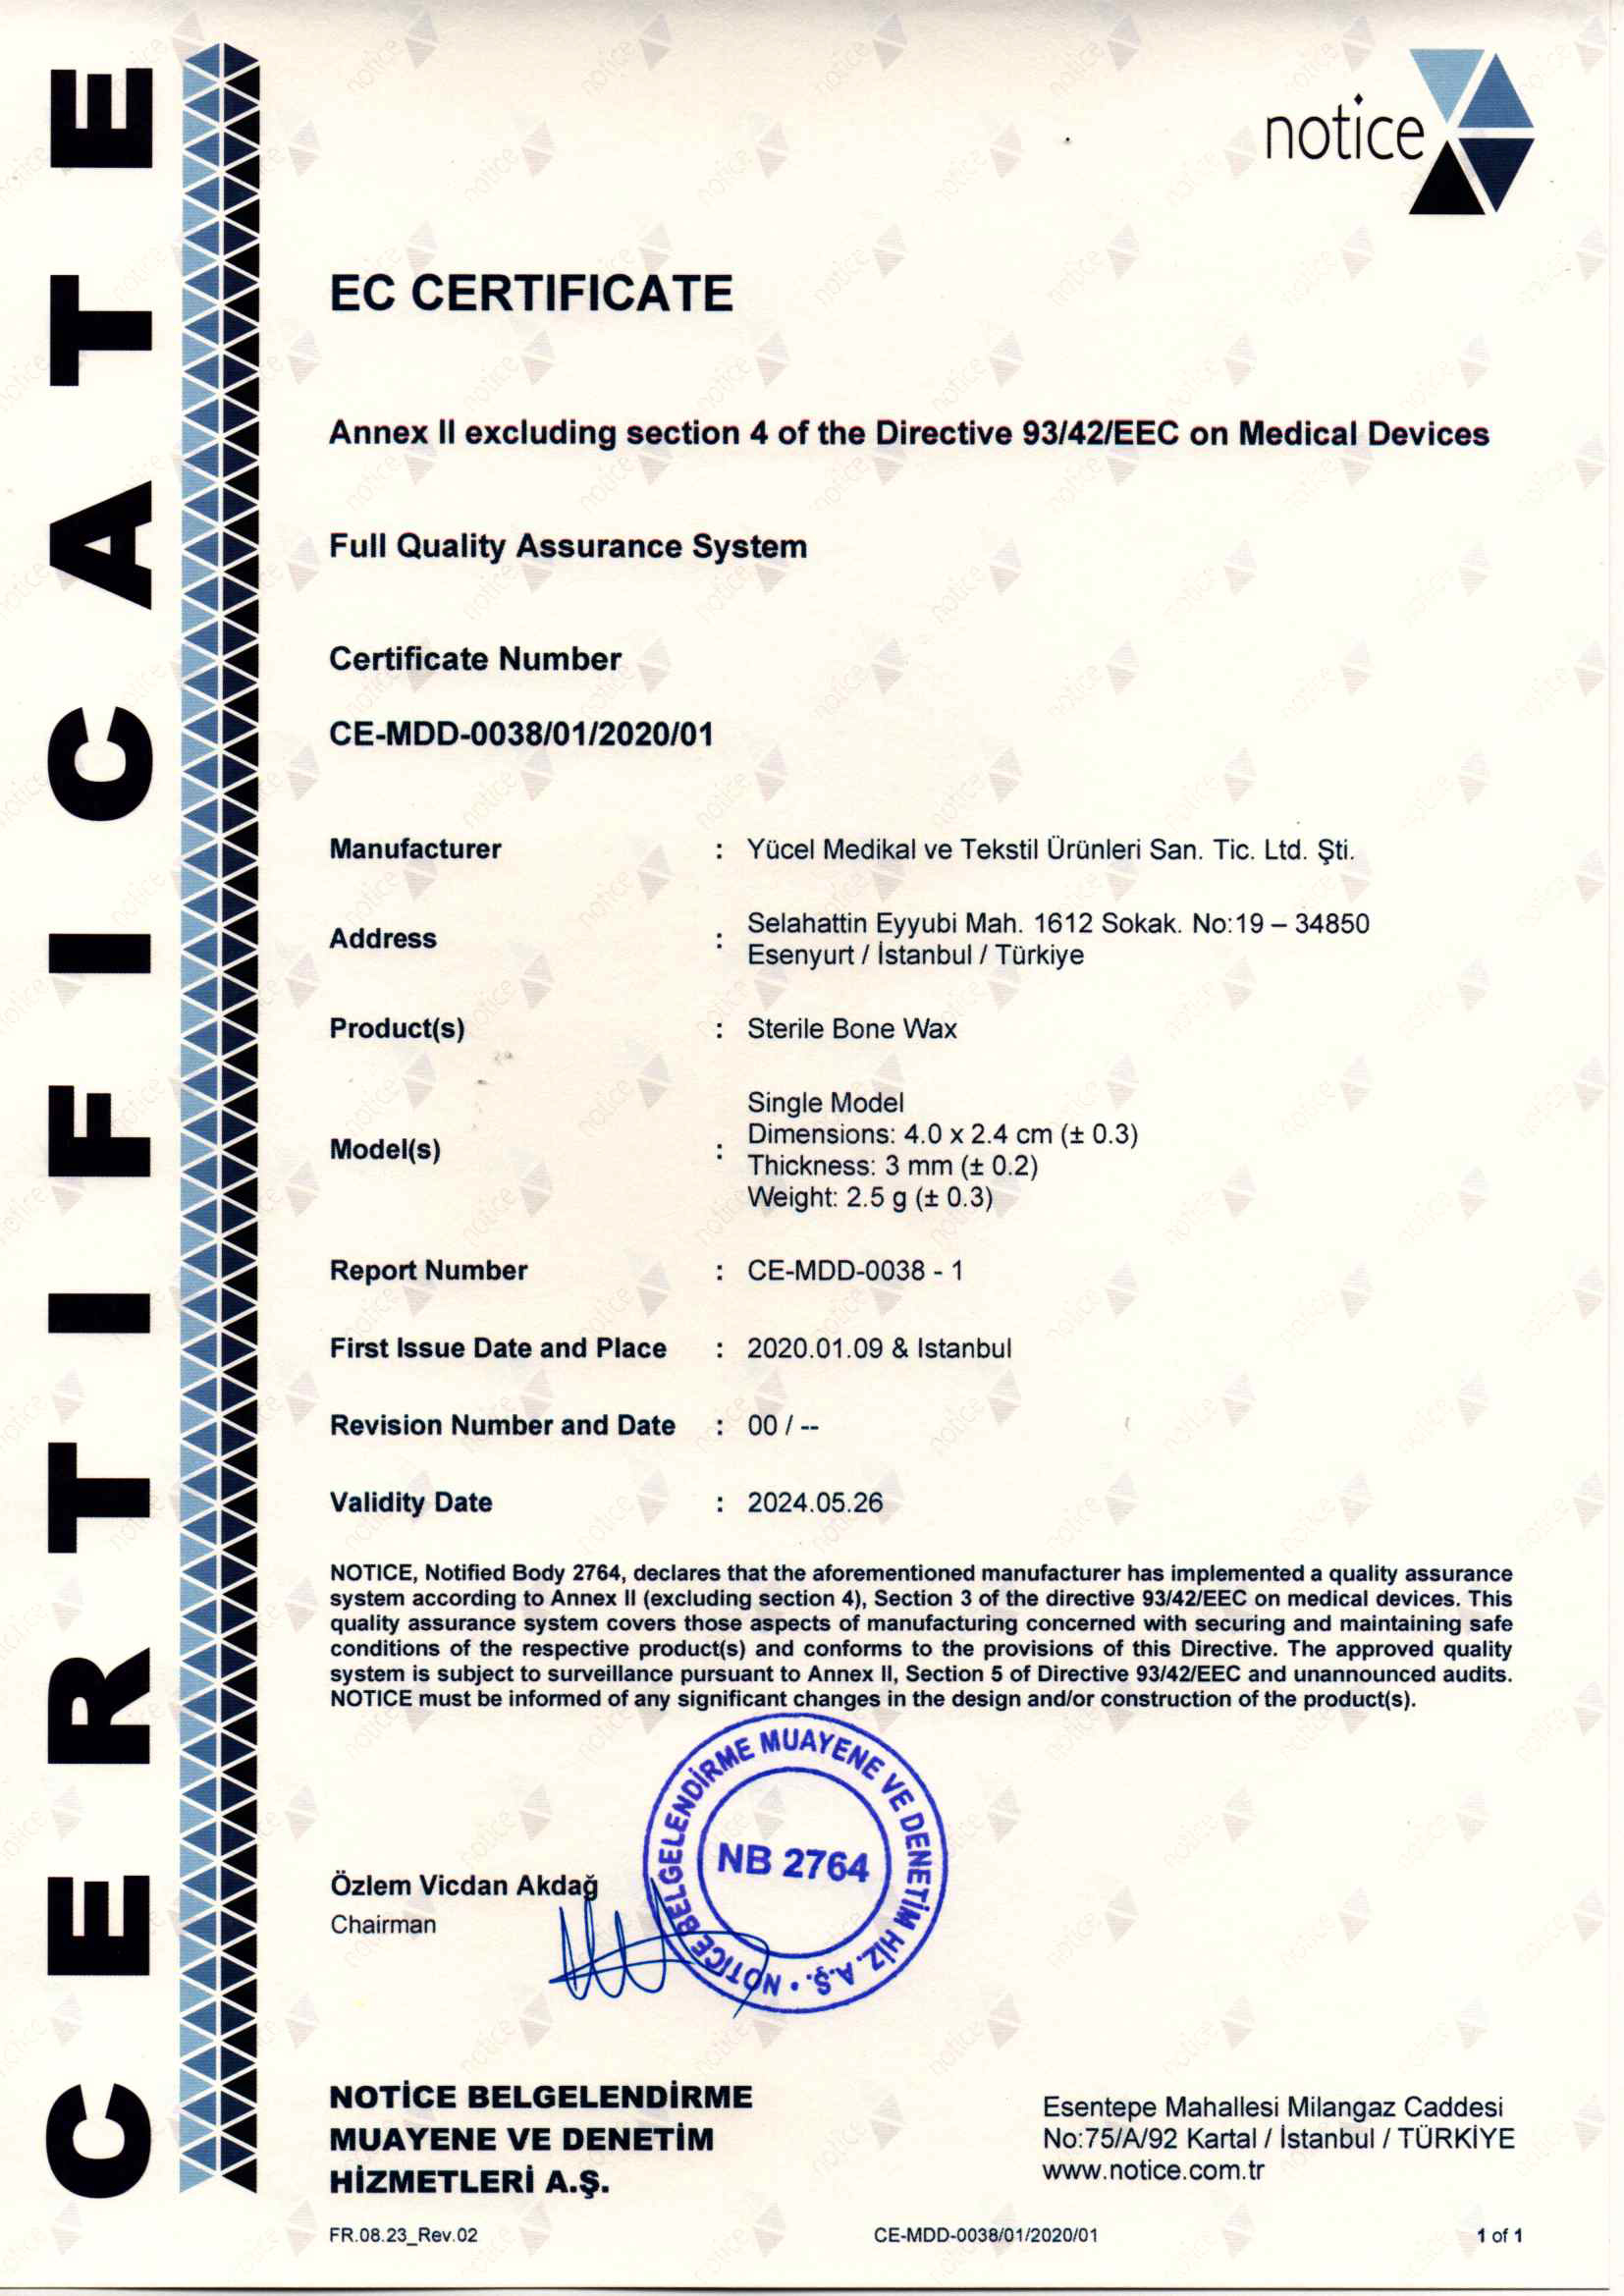 Bone Wax EC Certificate ENG20200123